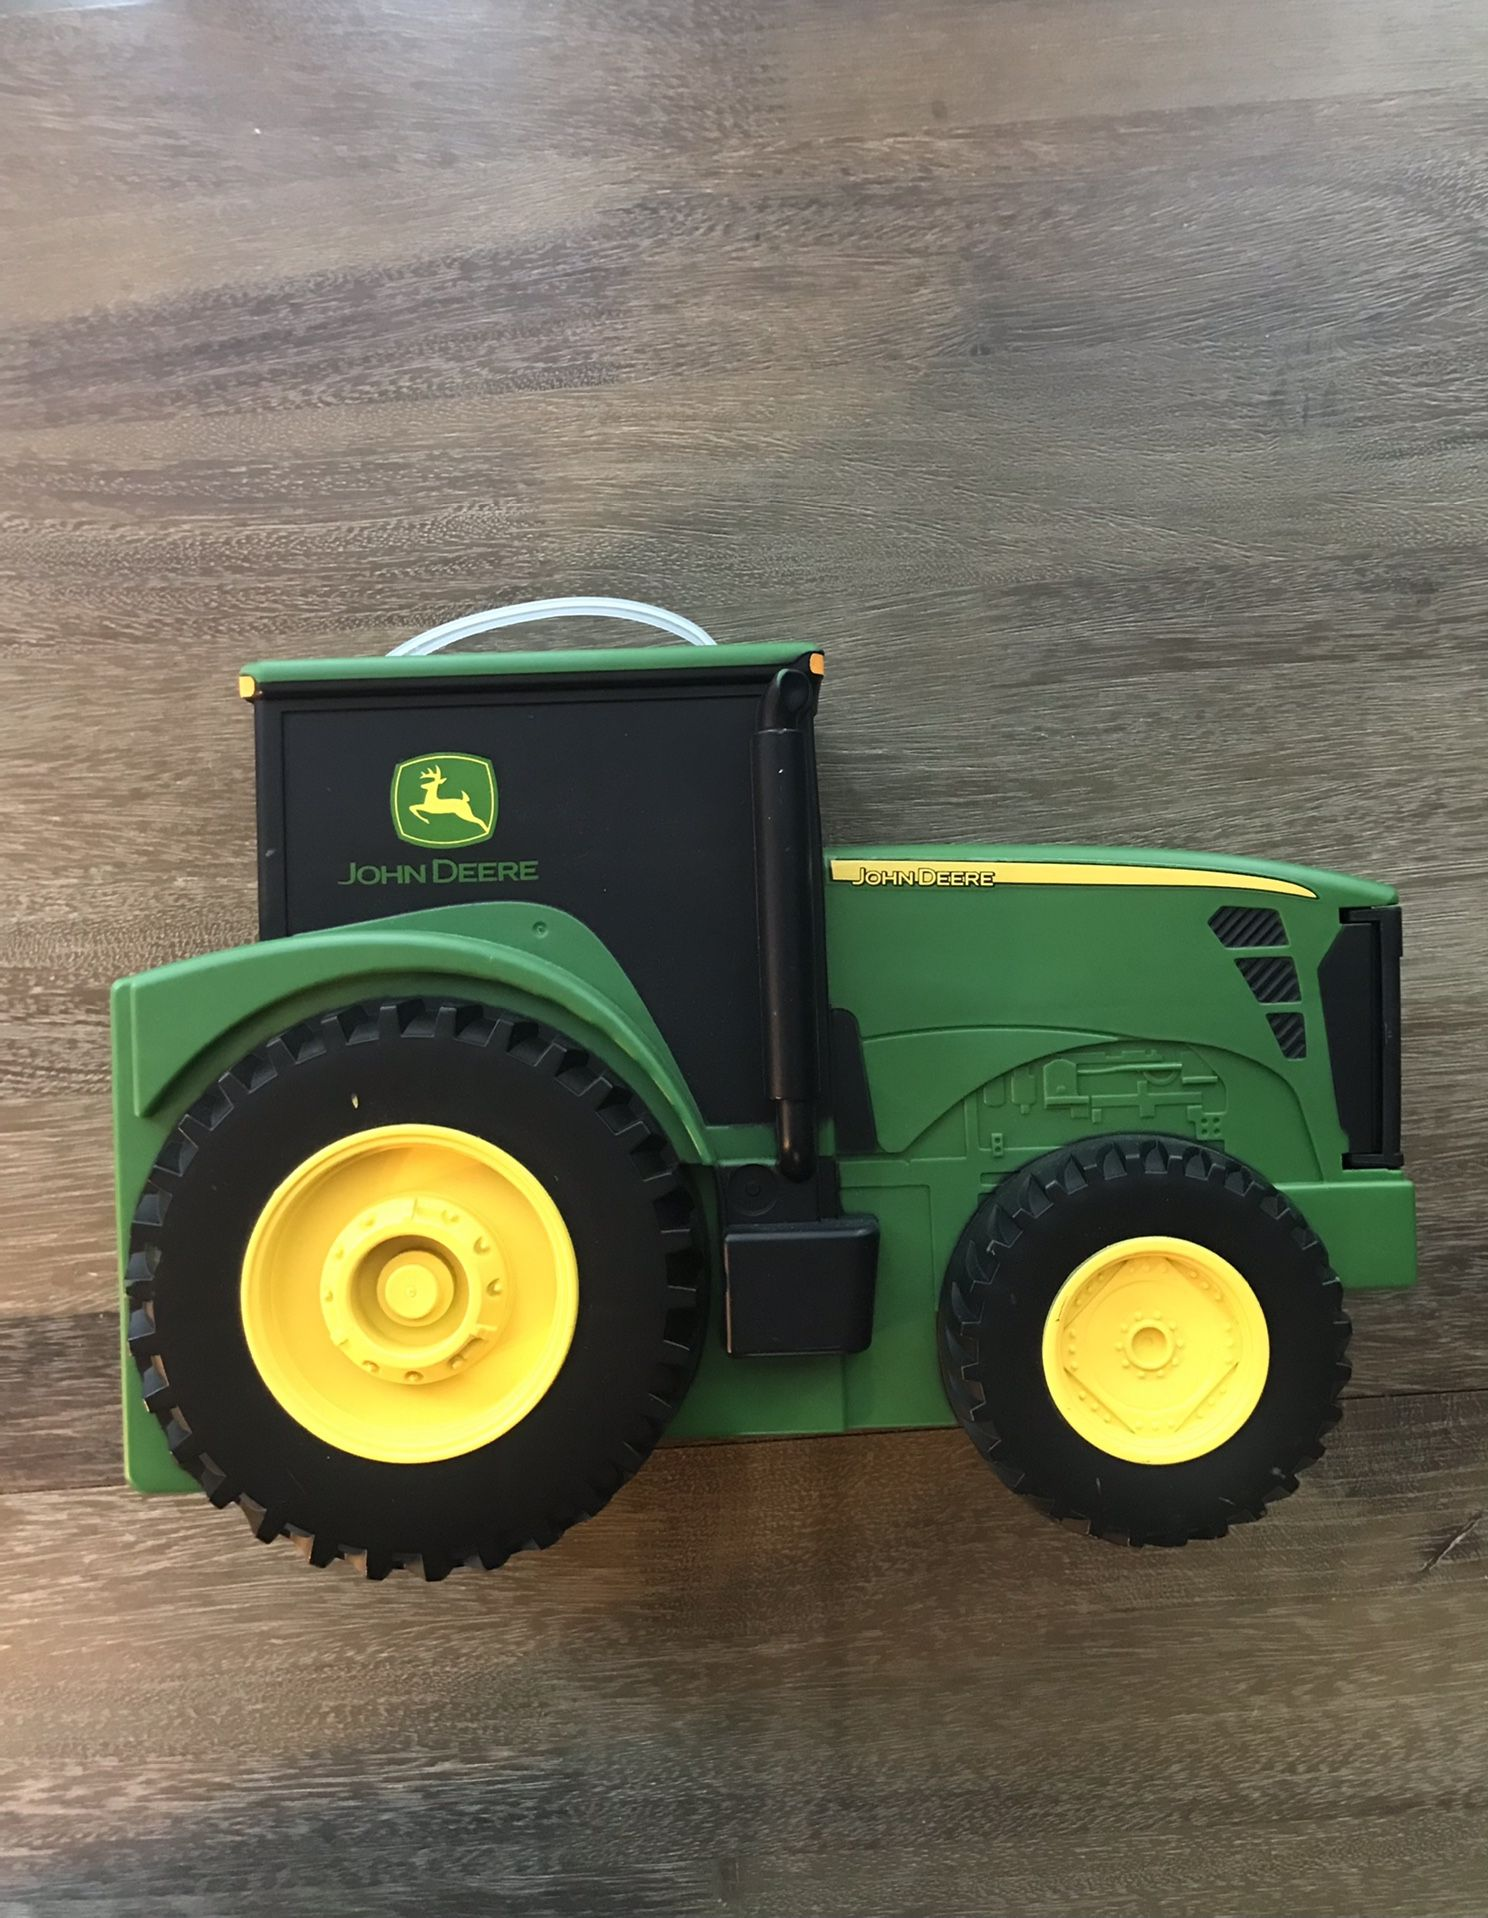 John Deere Toy carrier storage